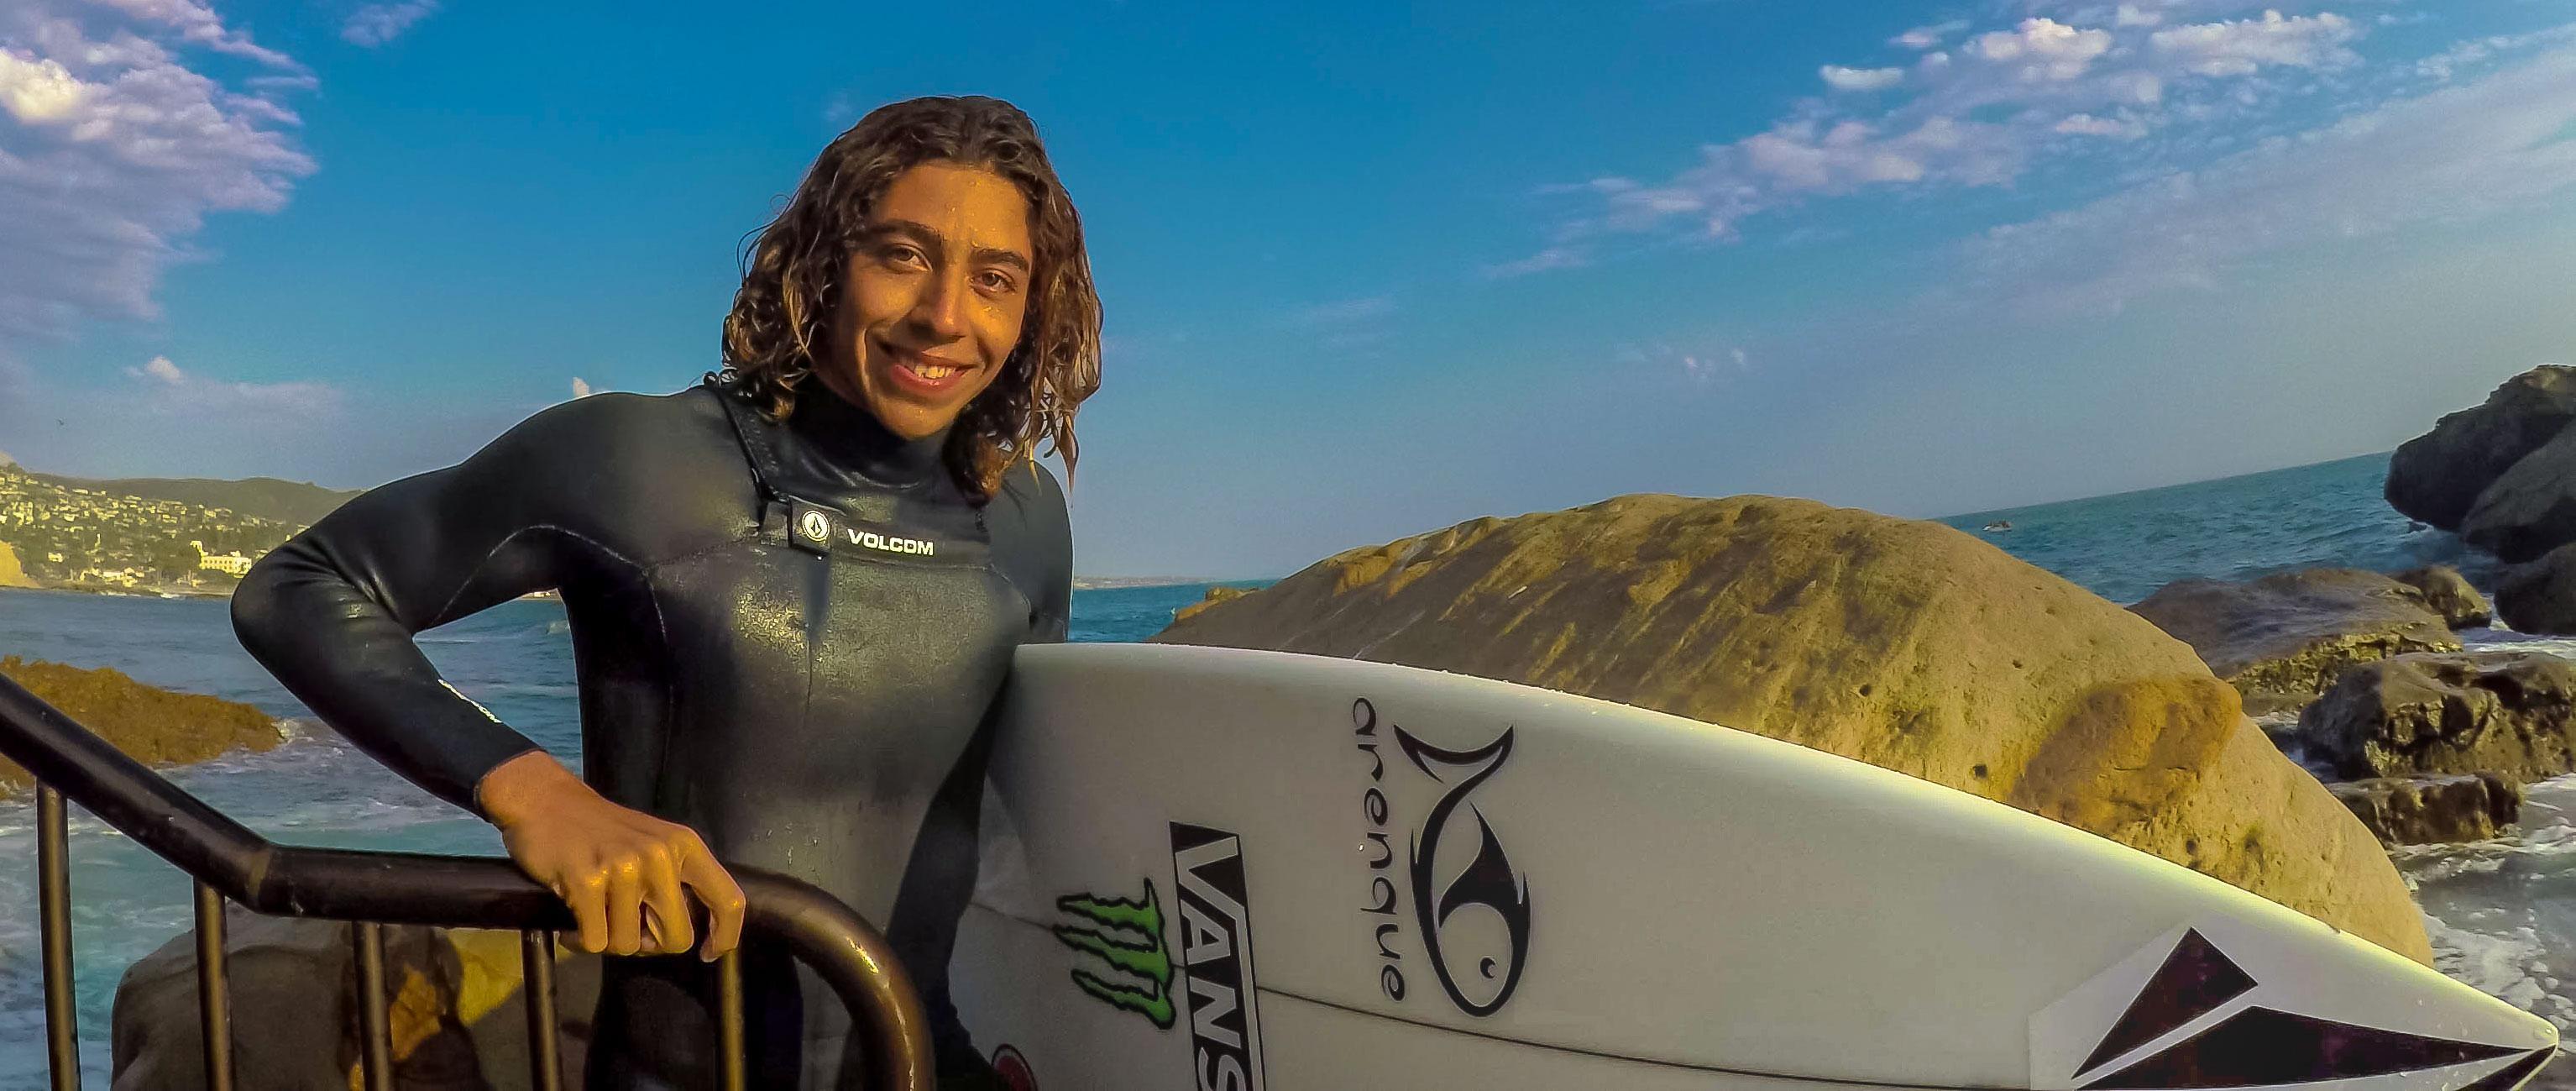 surfers-mcusmp417_48_42_22still001